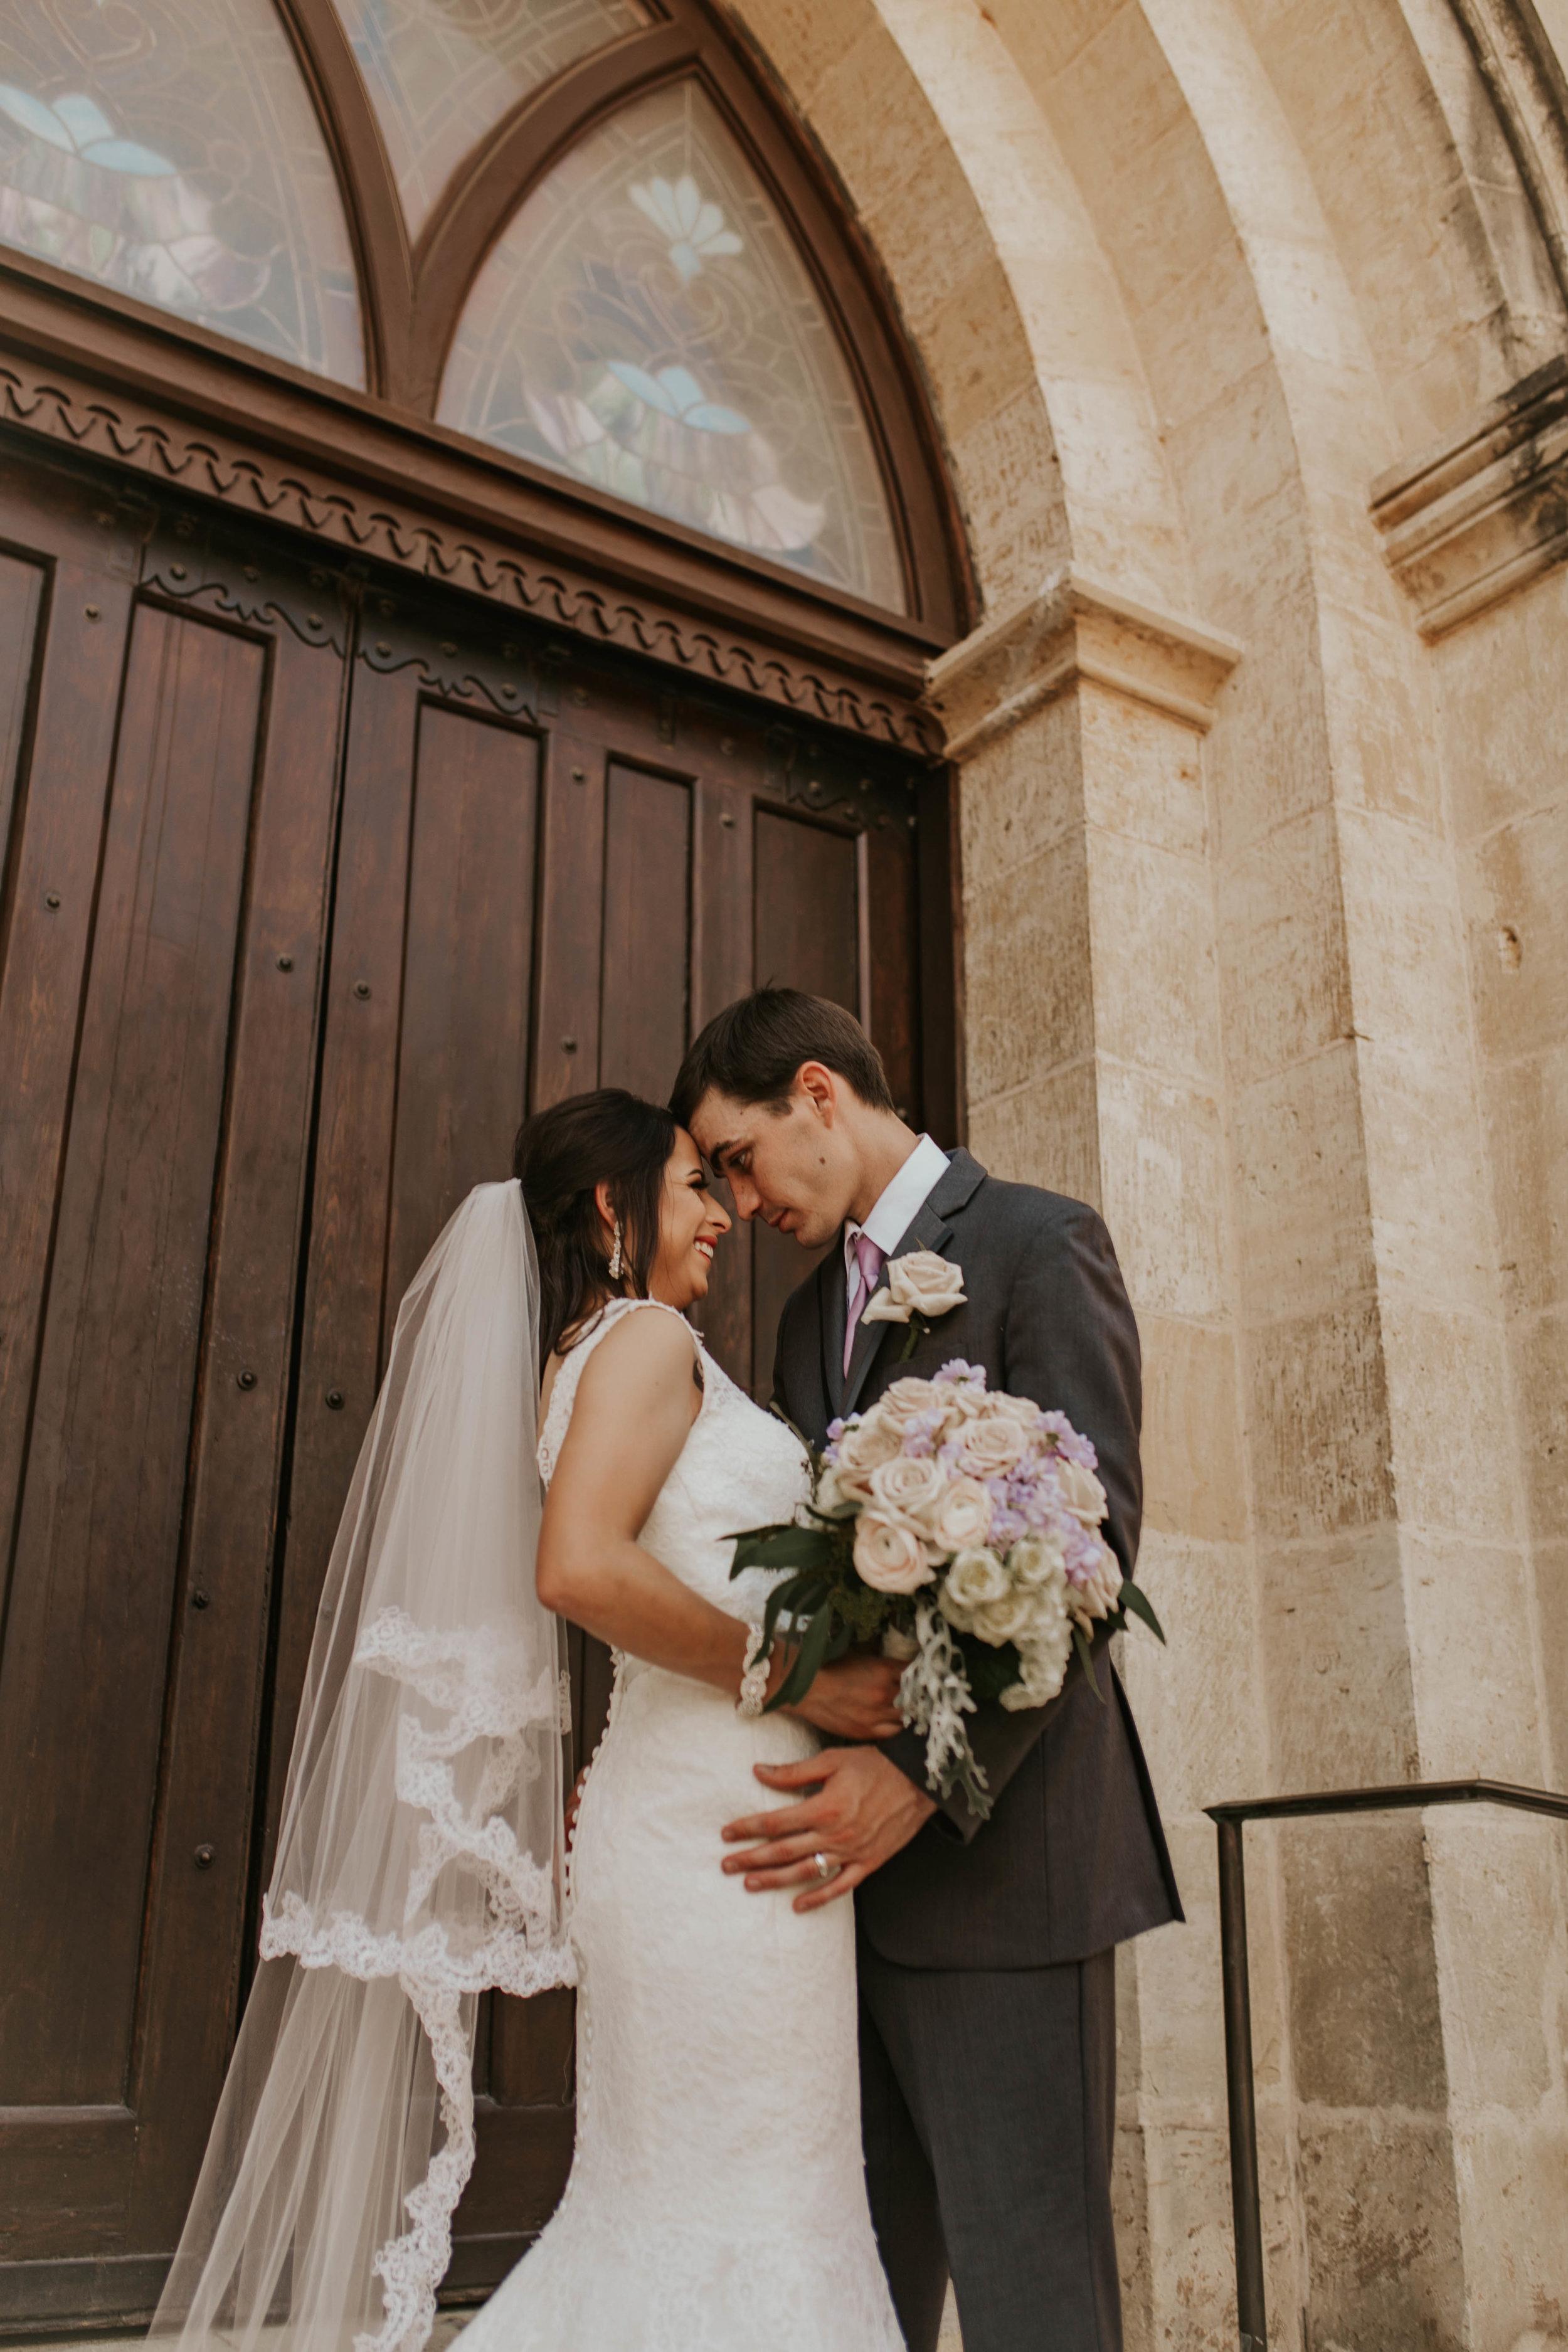 Marrisa_Nick_Wedding-65.jpg